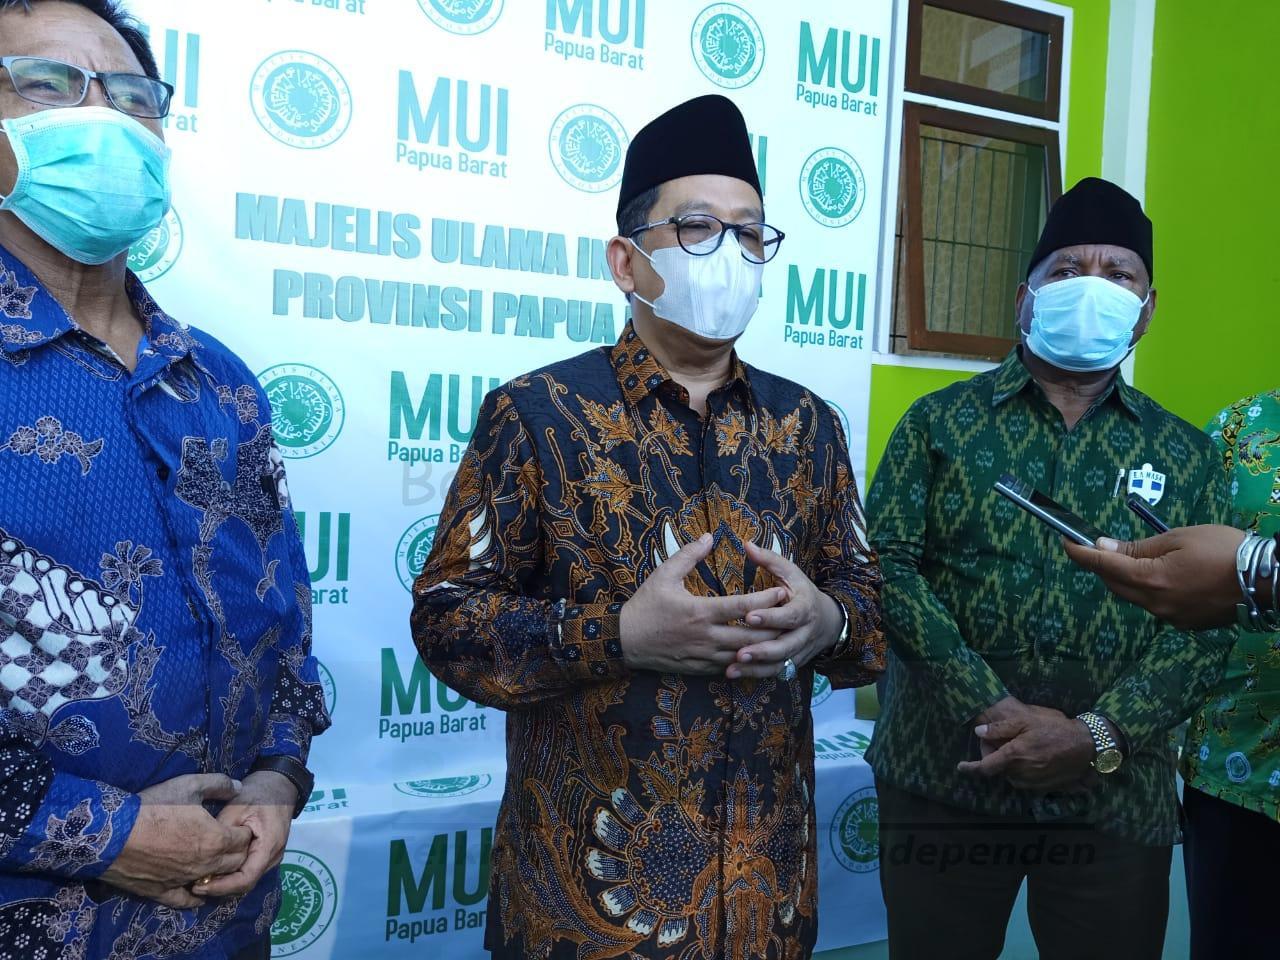 Wakil Menteri Agama Puji Gubernur Mandacan Bisa Jaga Toleransi Umat Beragama 10 IMG 20200821 WA0032